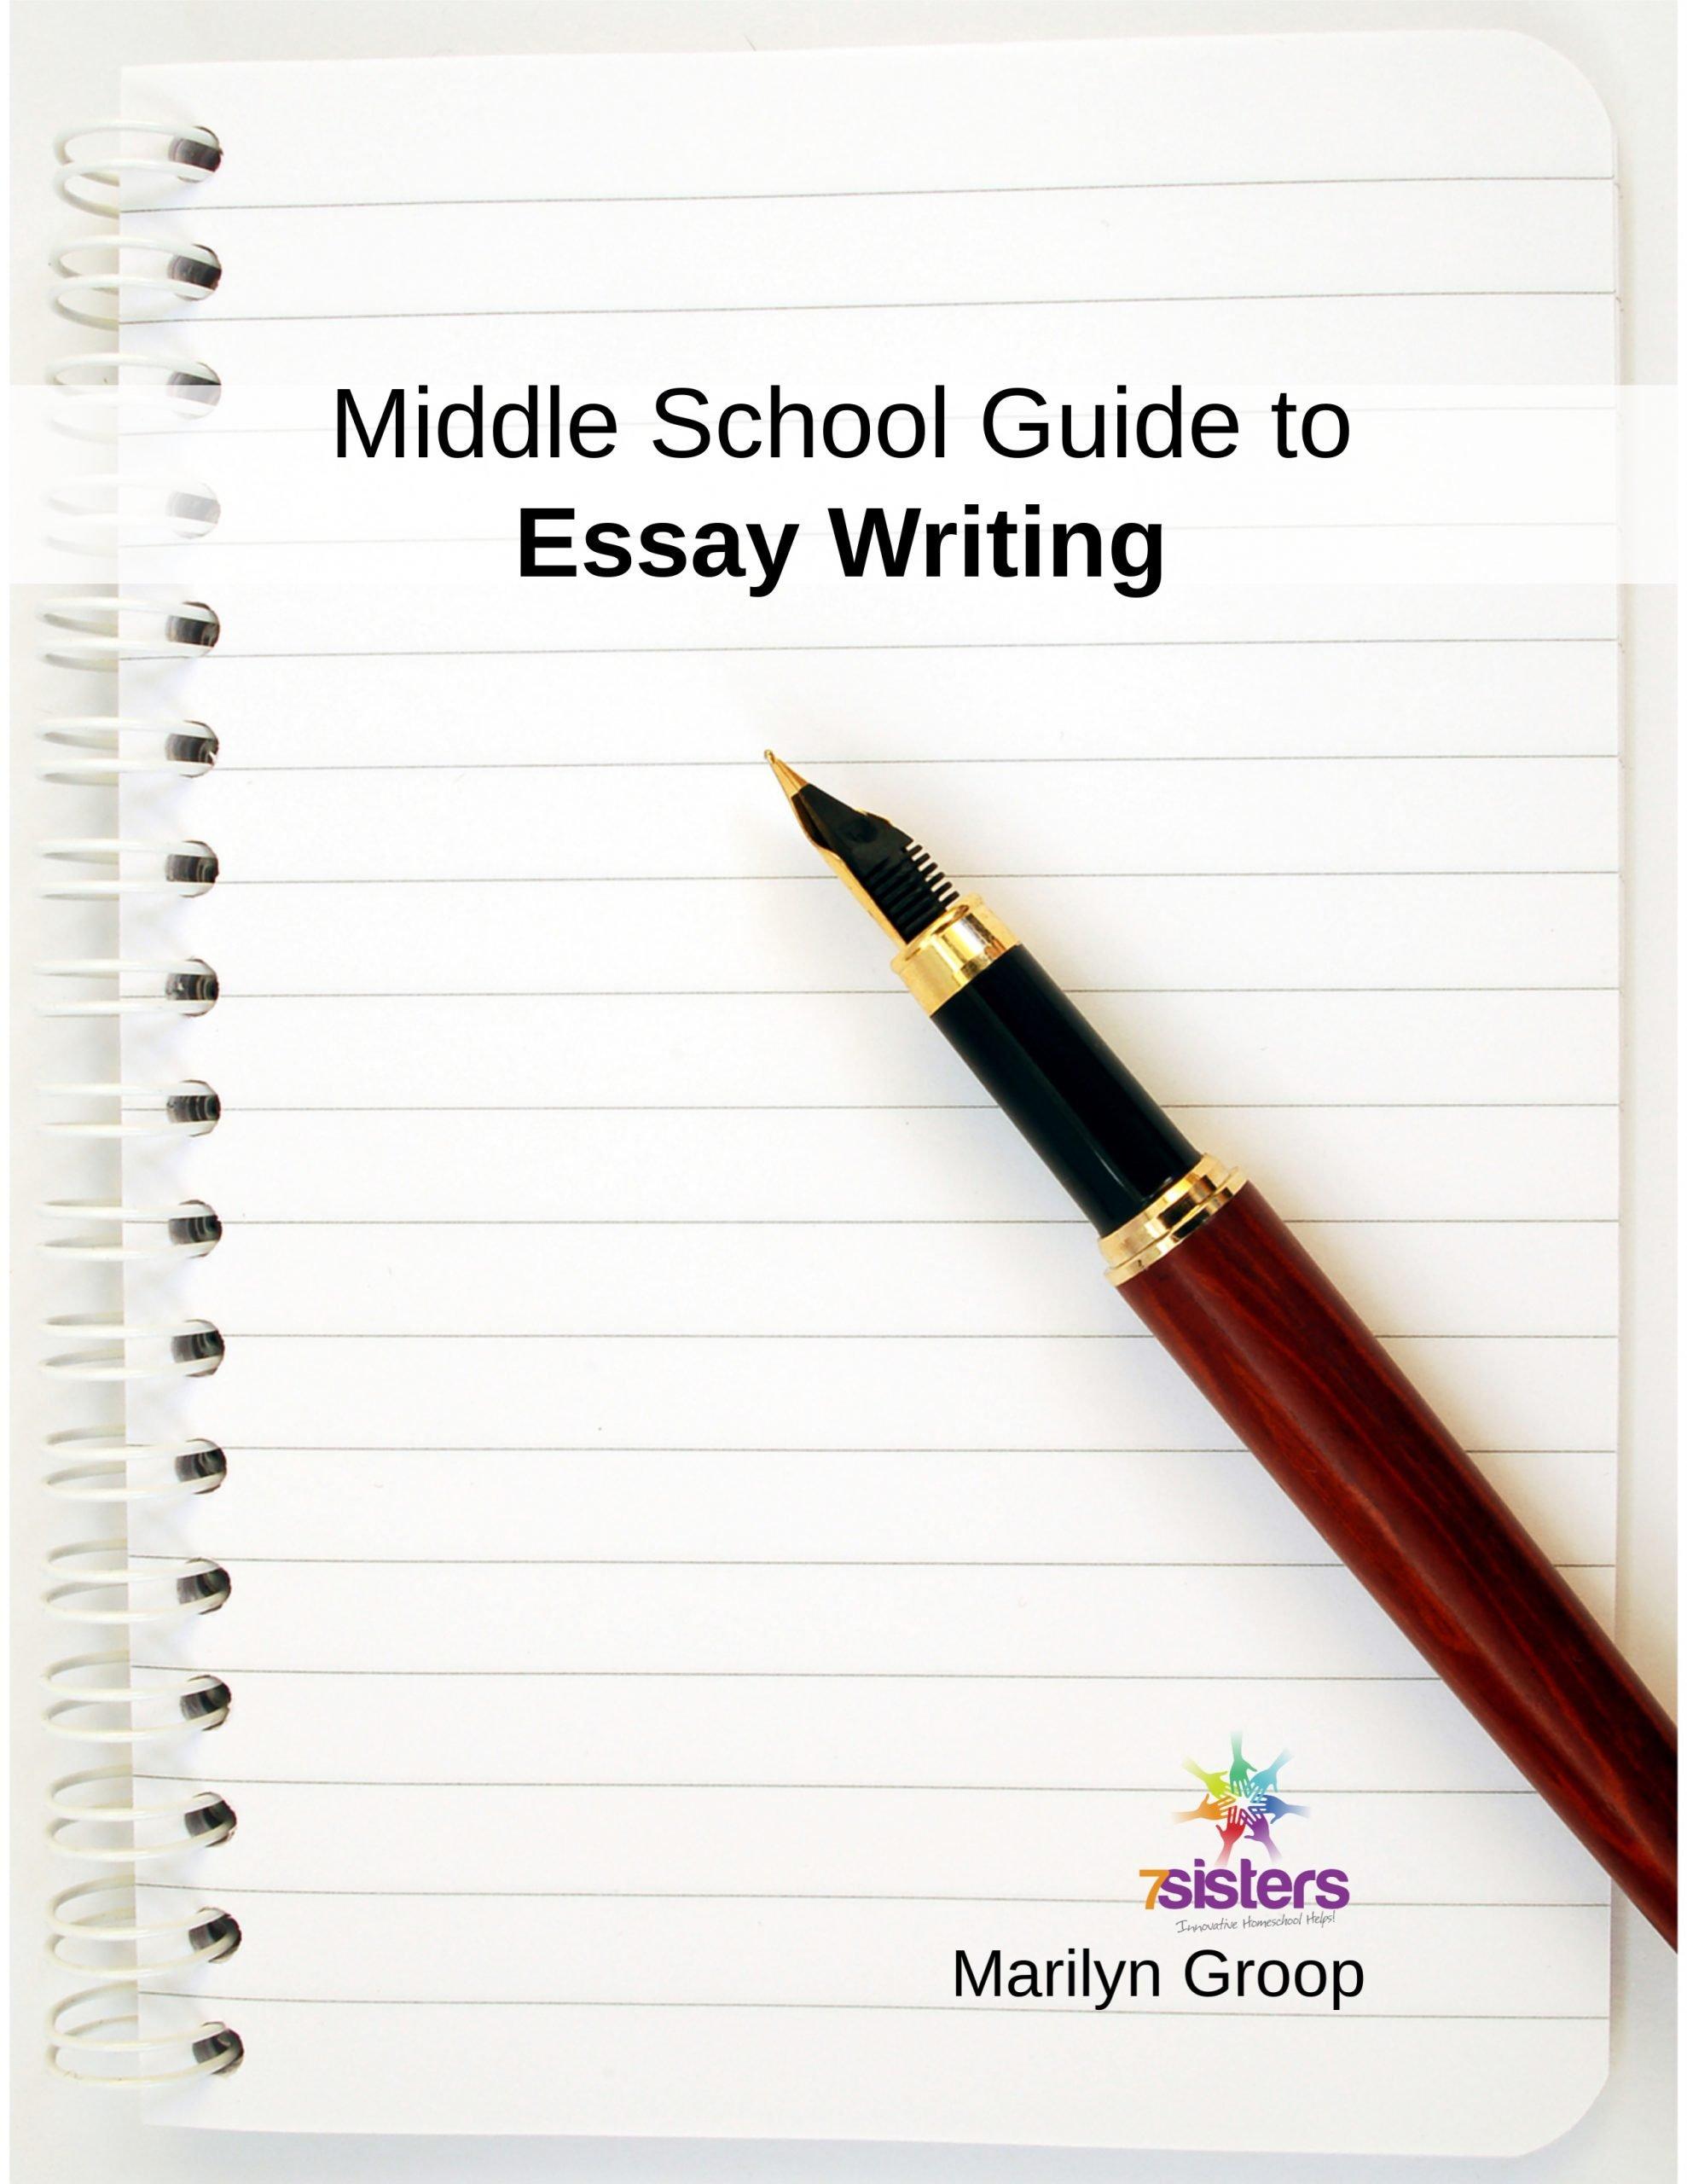 Middle School Essay Writing